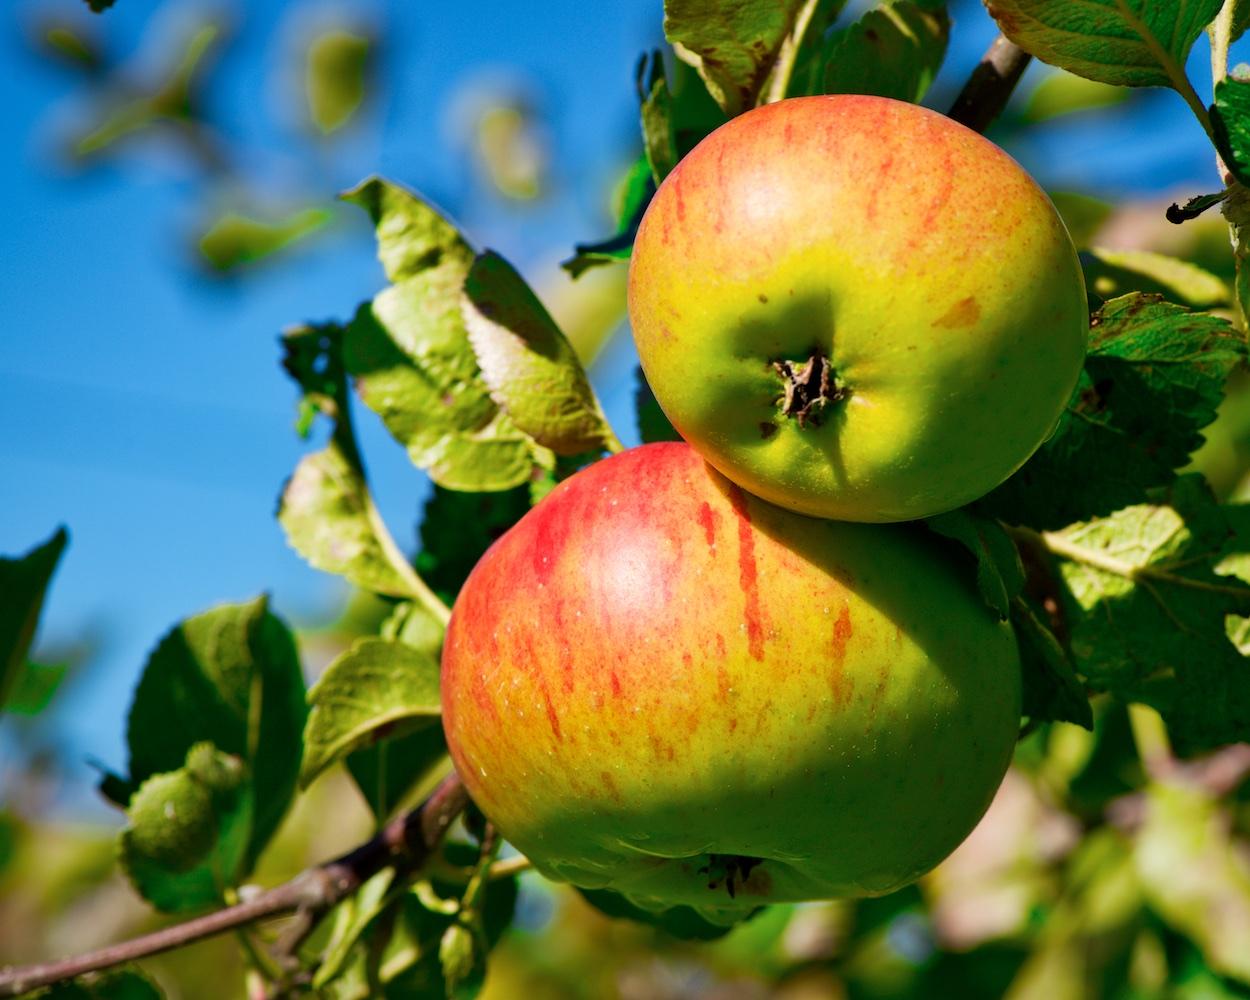 Orchard_ND80883